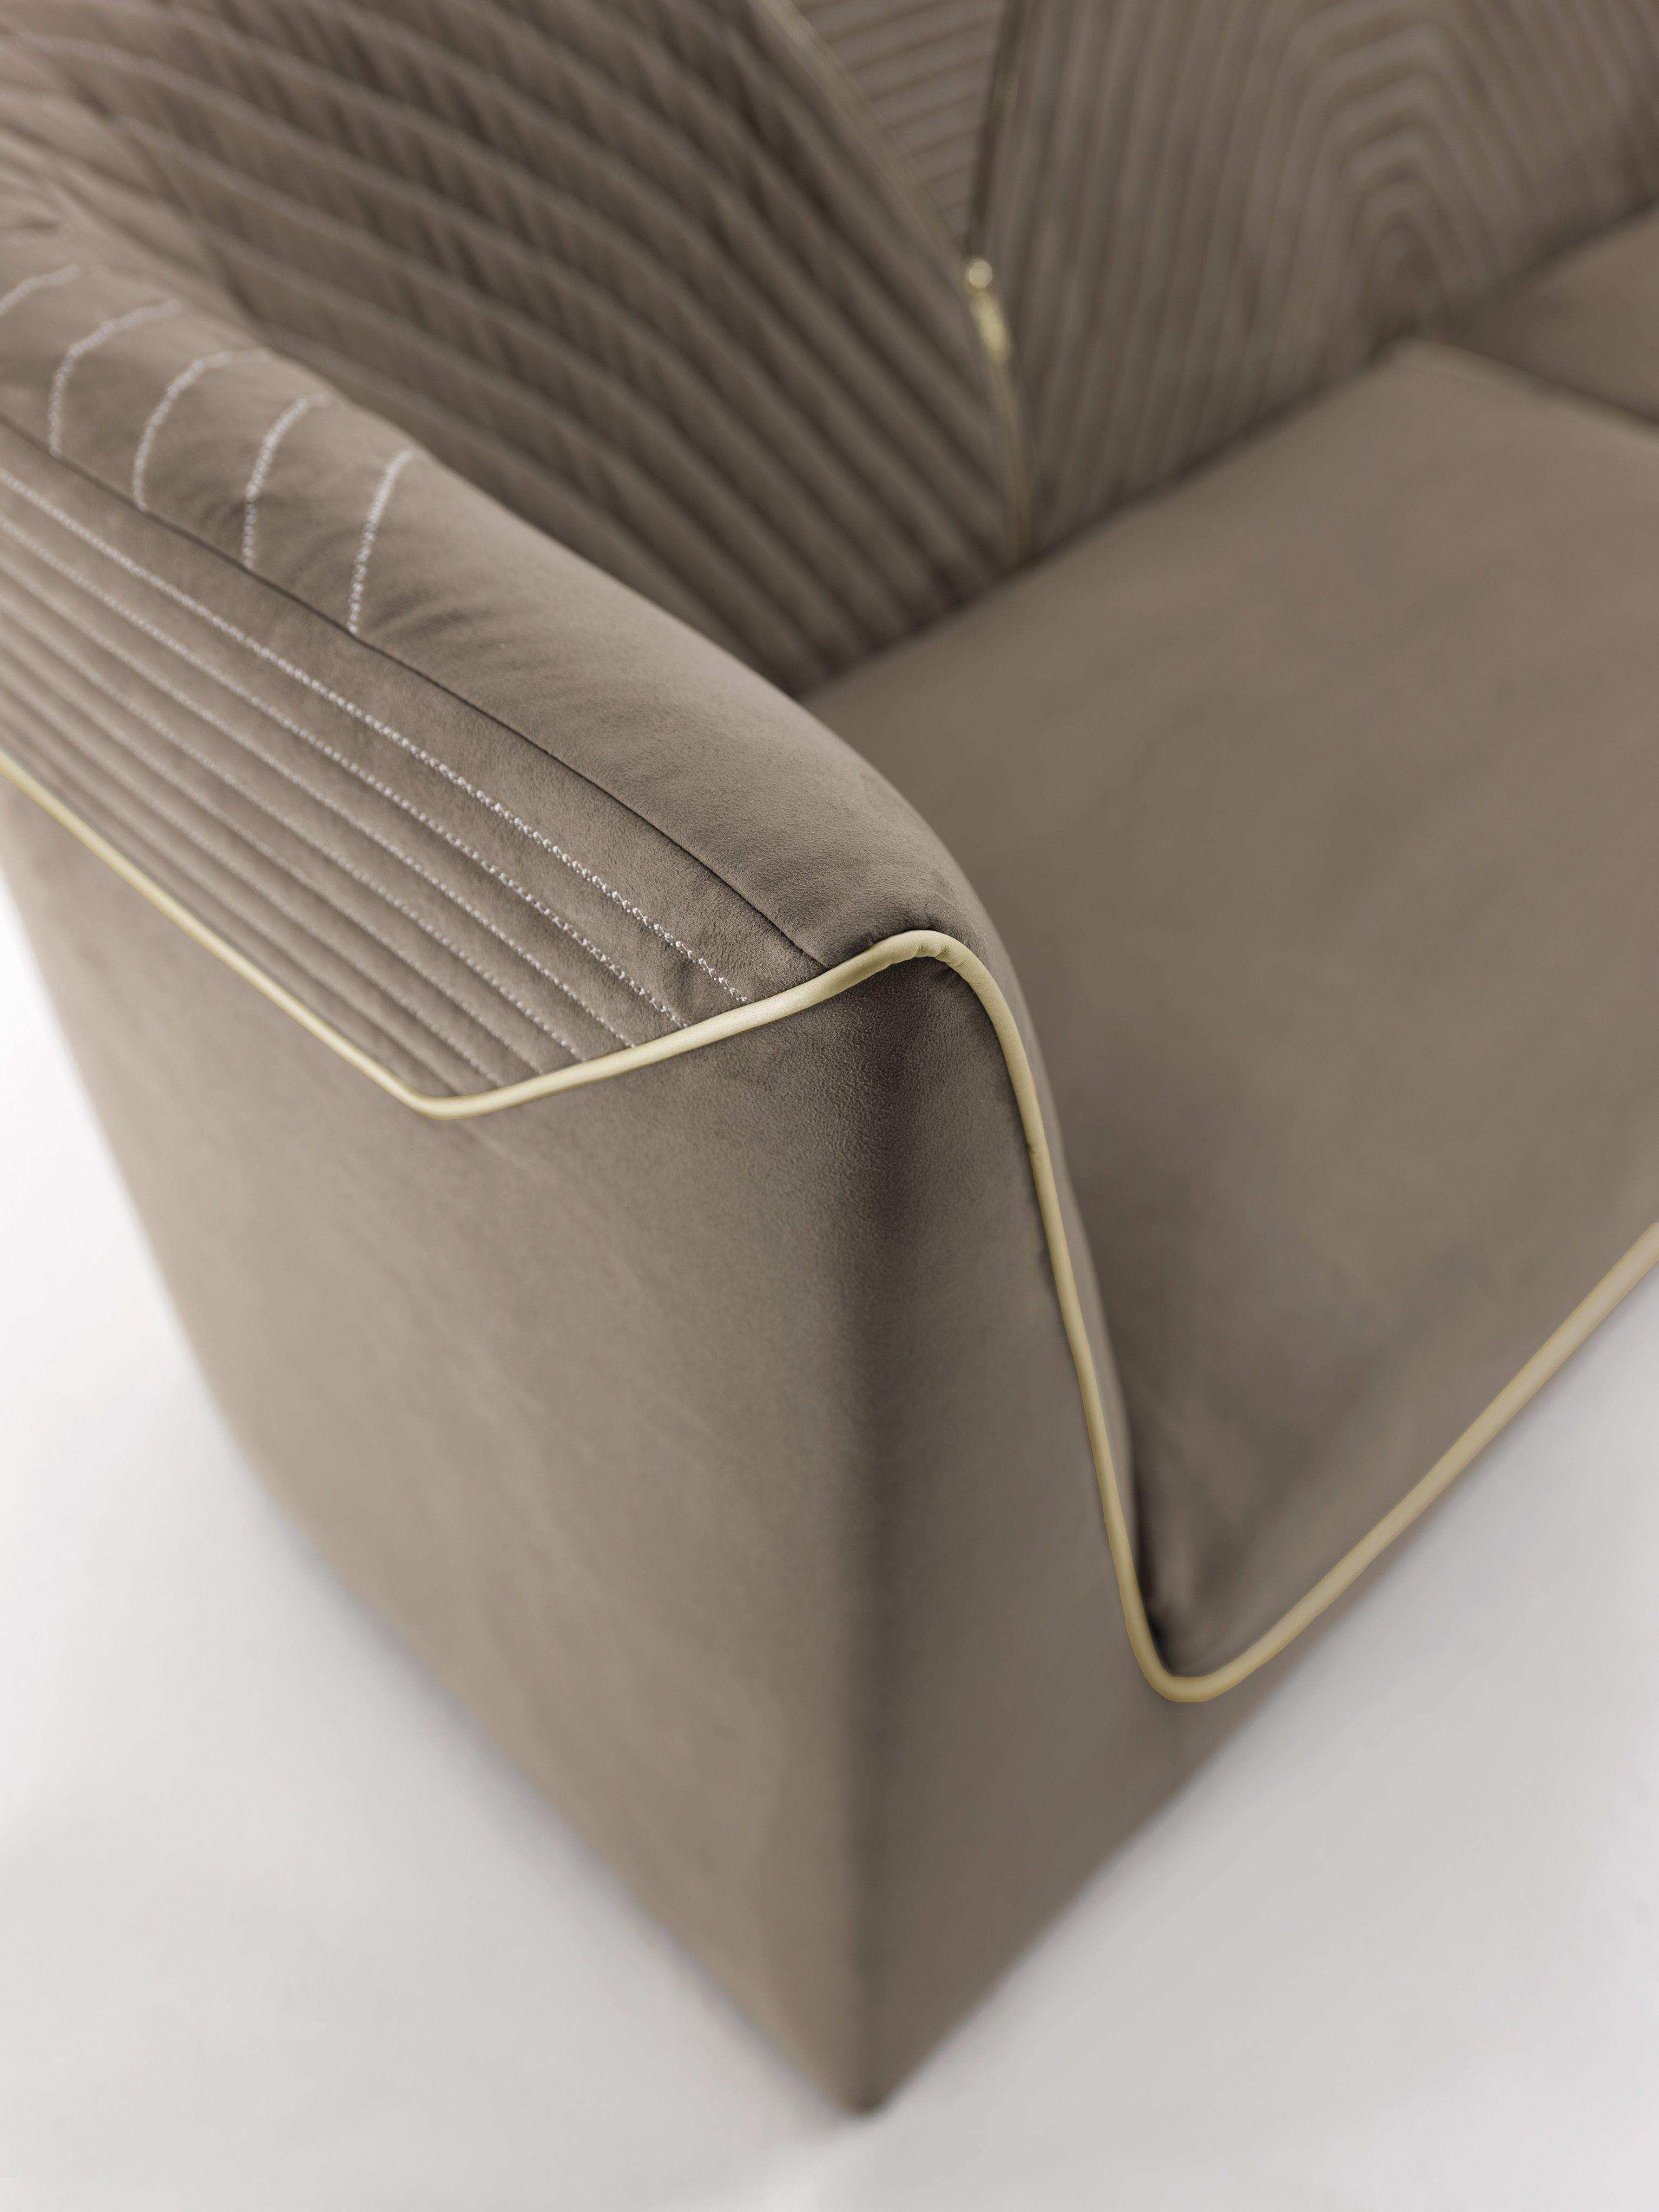 Ranieri Sofa Luxury Sofa Sofa Handmade Sofa Reupholstered